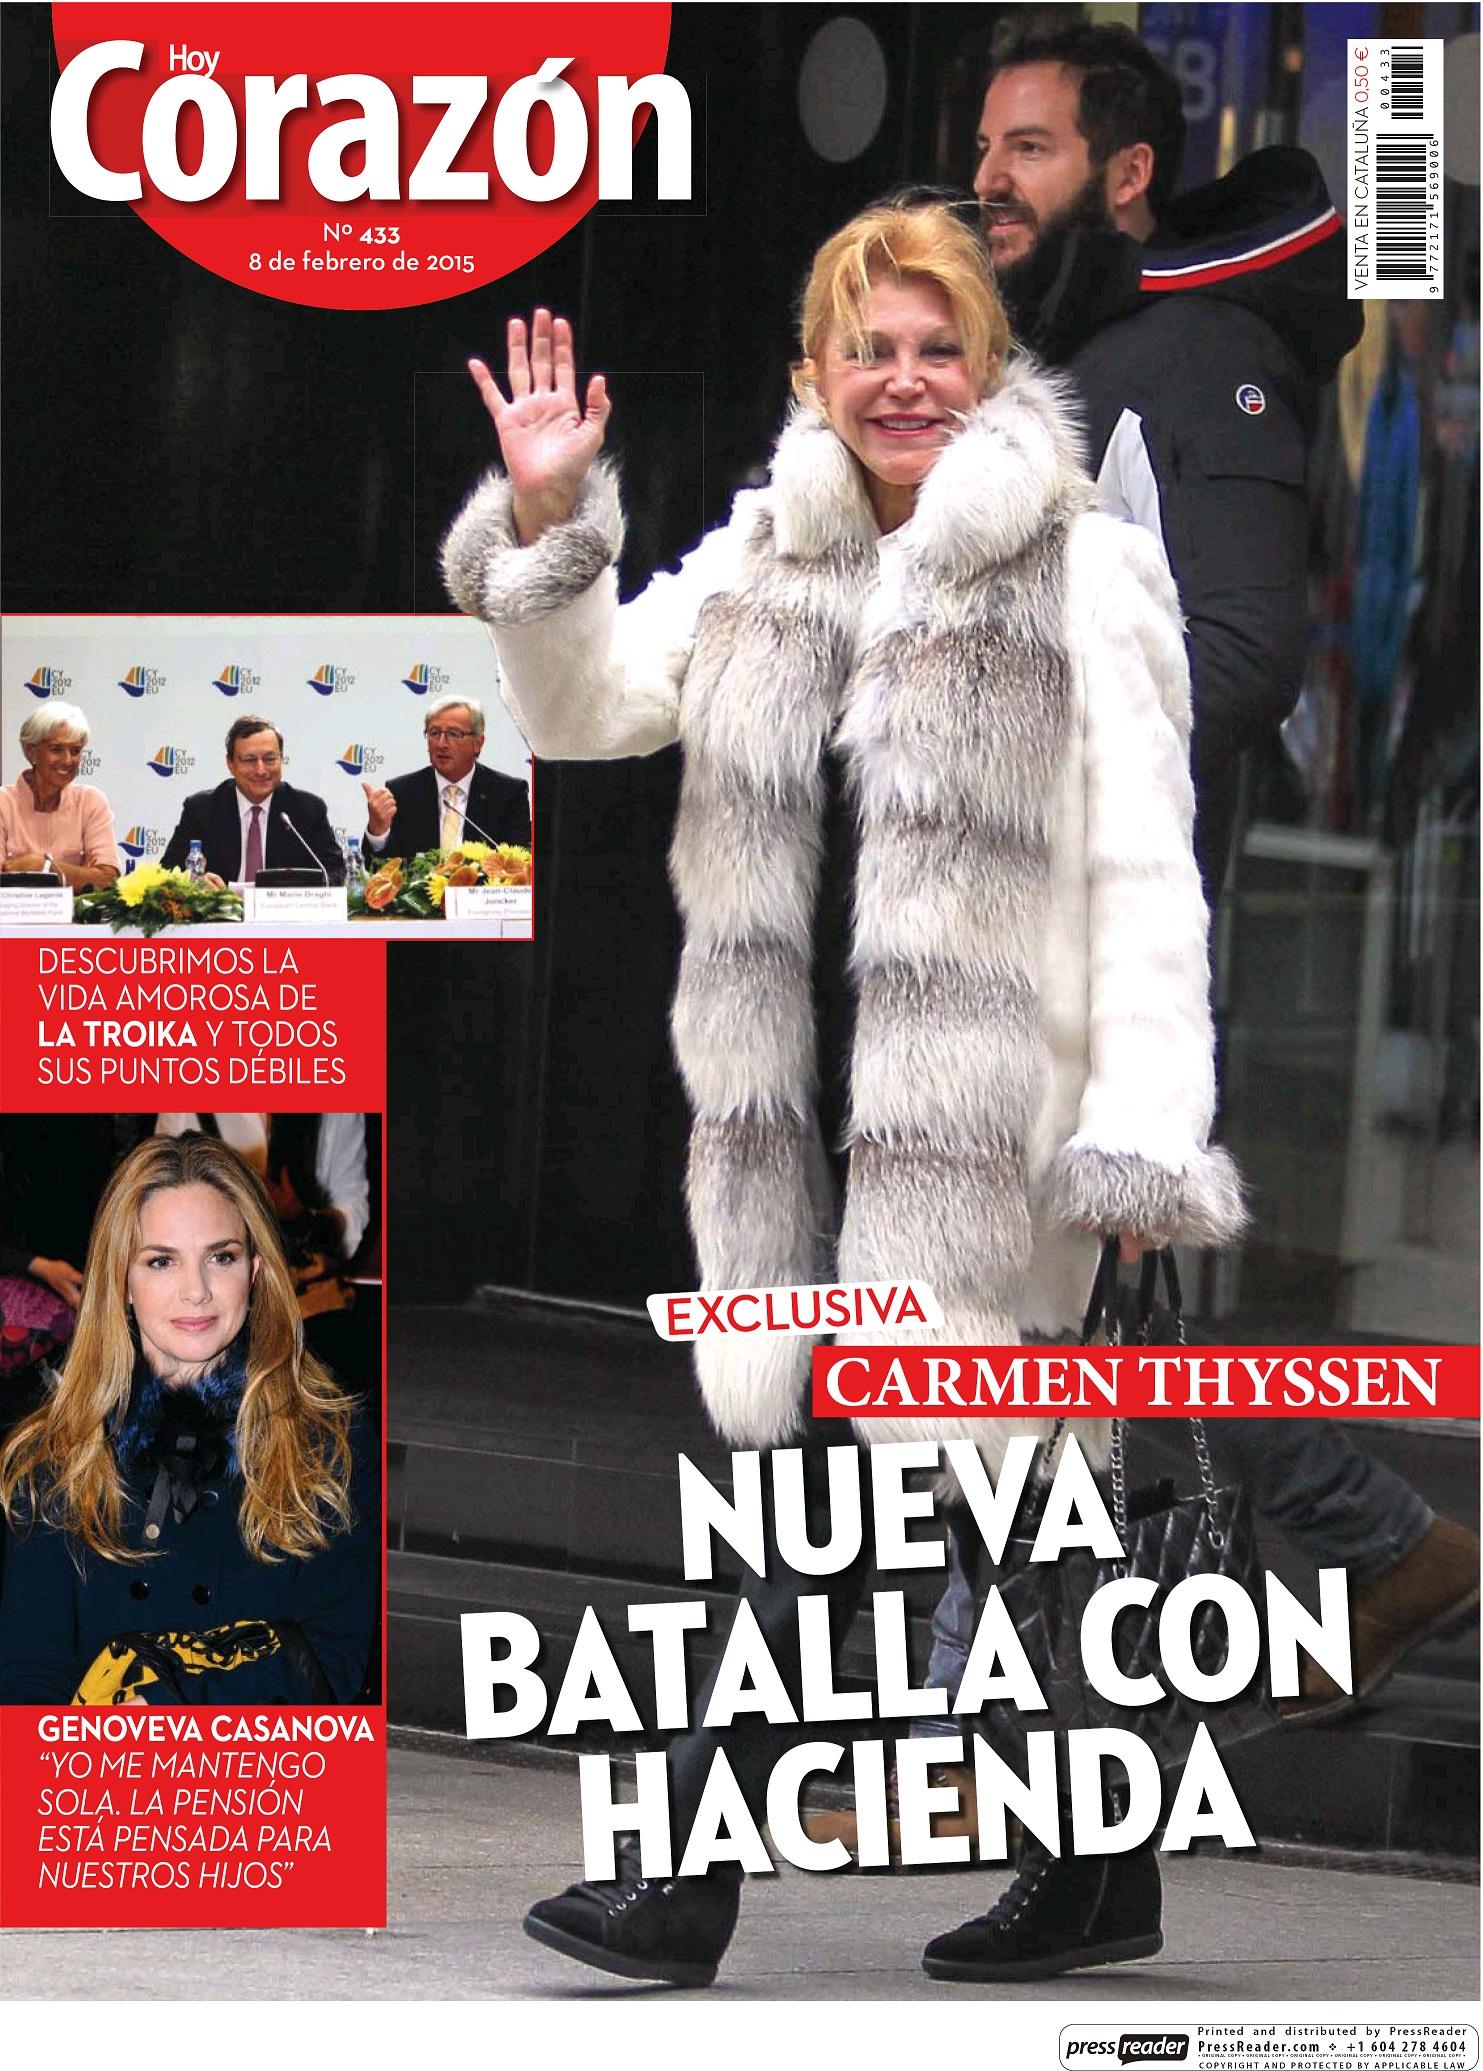 HOY CORAZON portada 8 de Febrero 2015